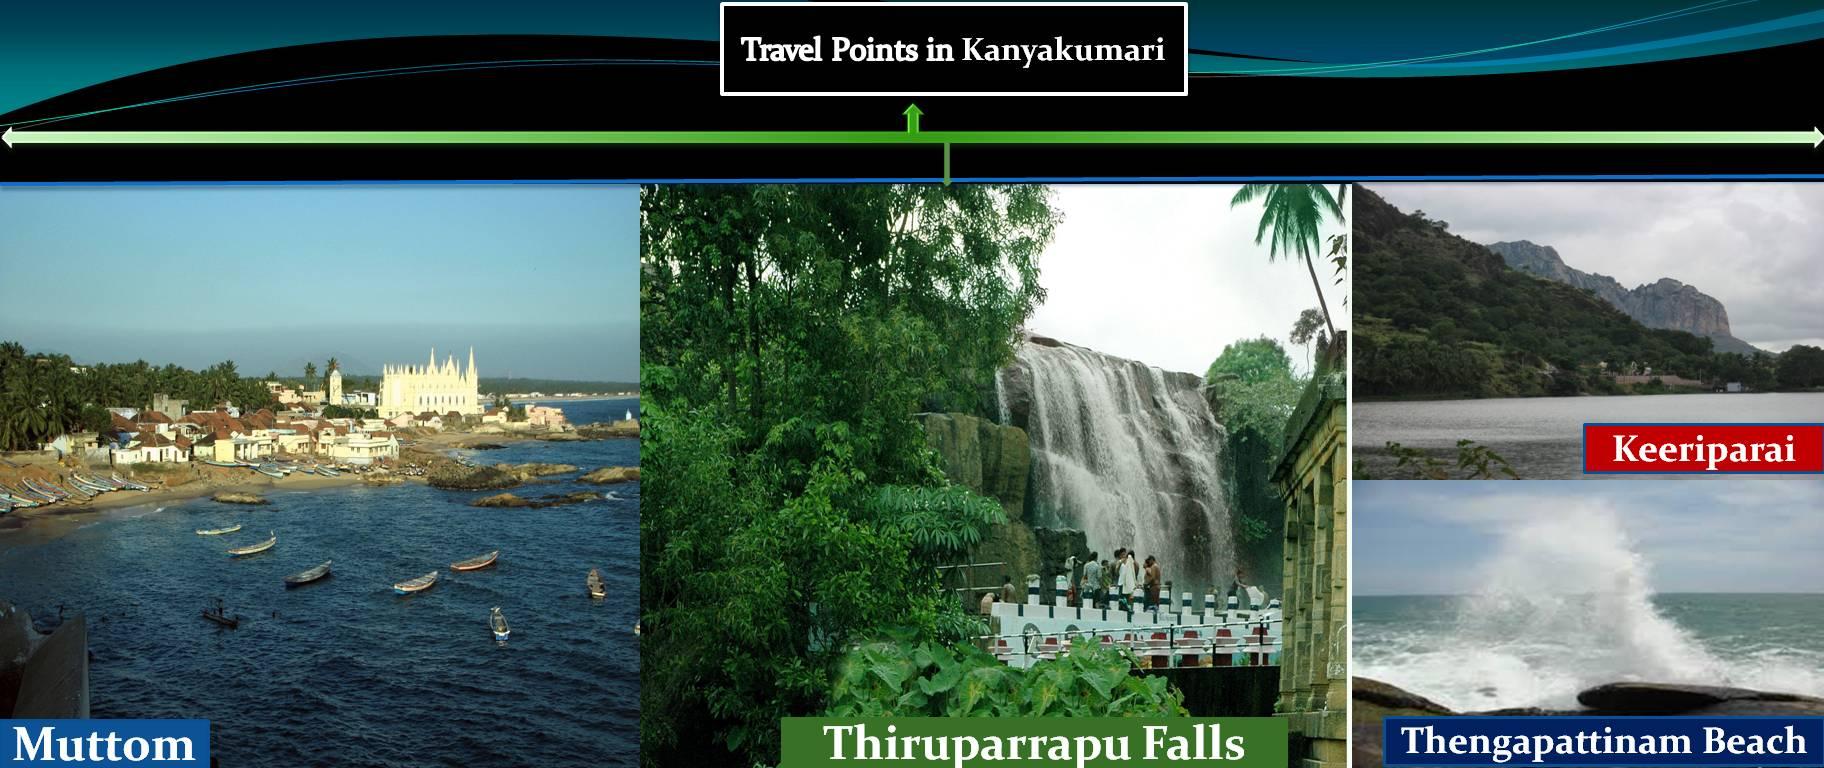 Travel Point in Kanyakumari